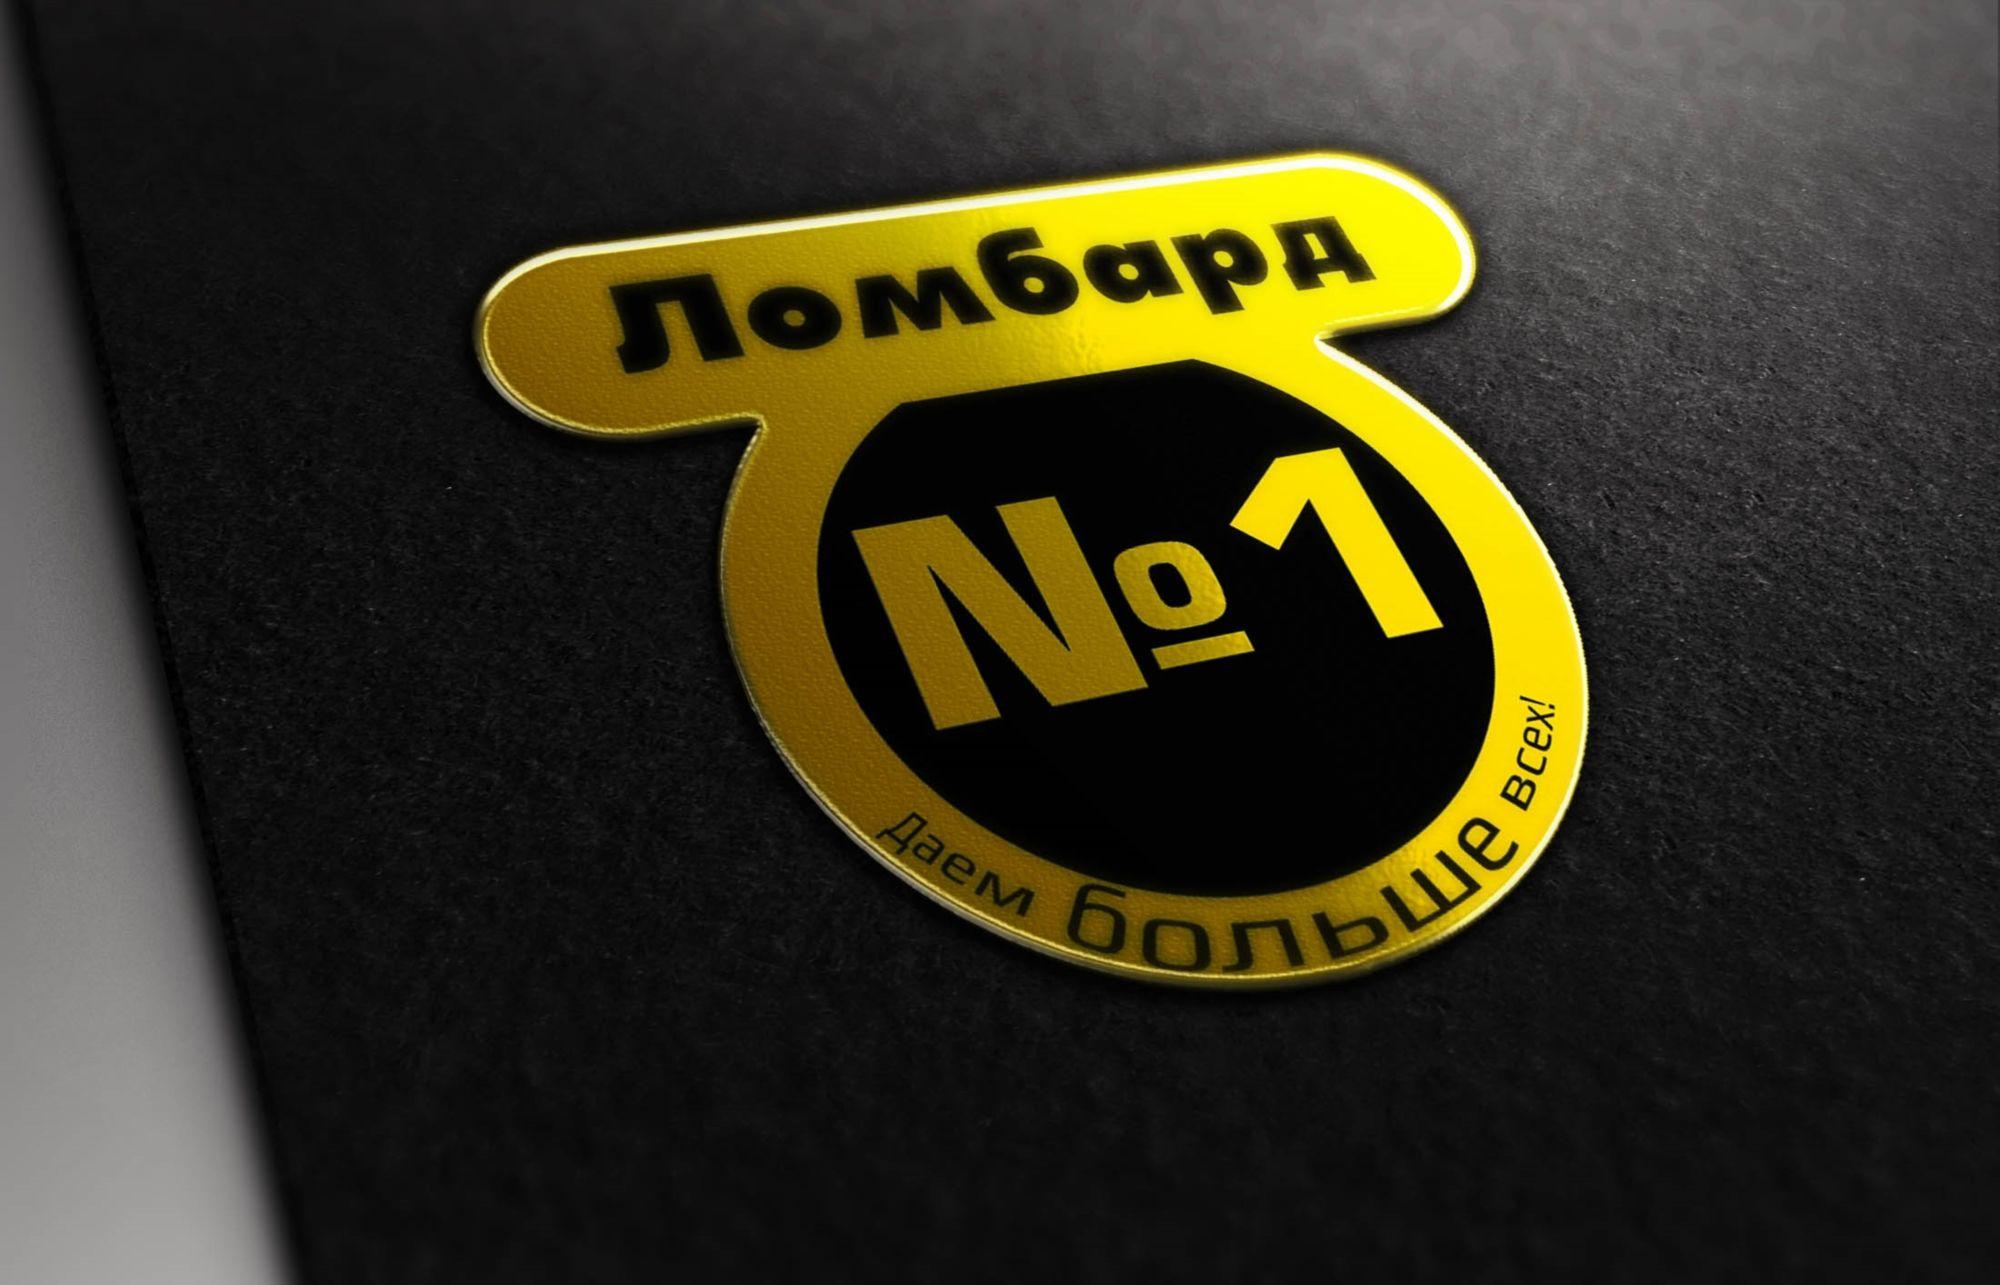 Дизайн логотипа Ломбард №1 - дизайнер baltomal